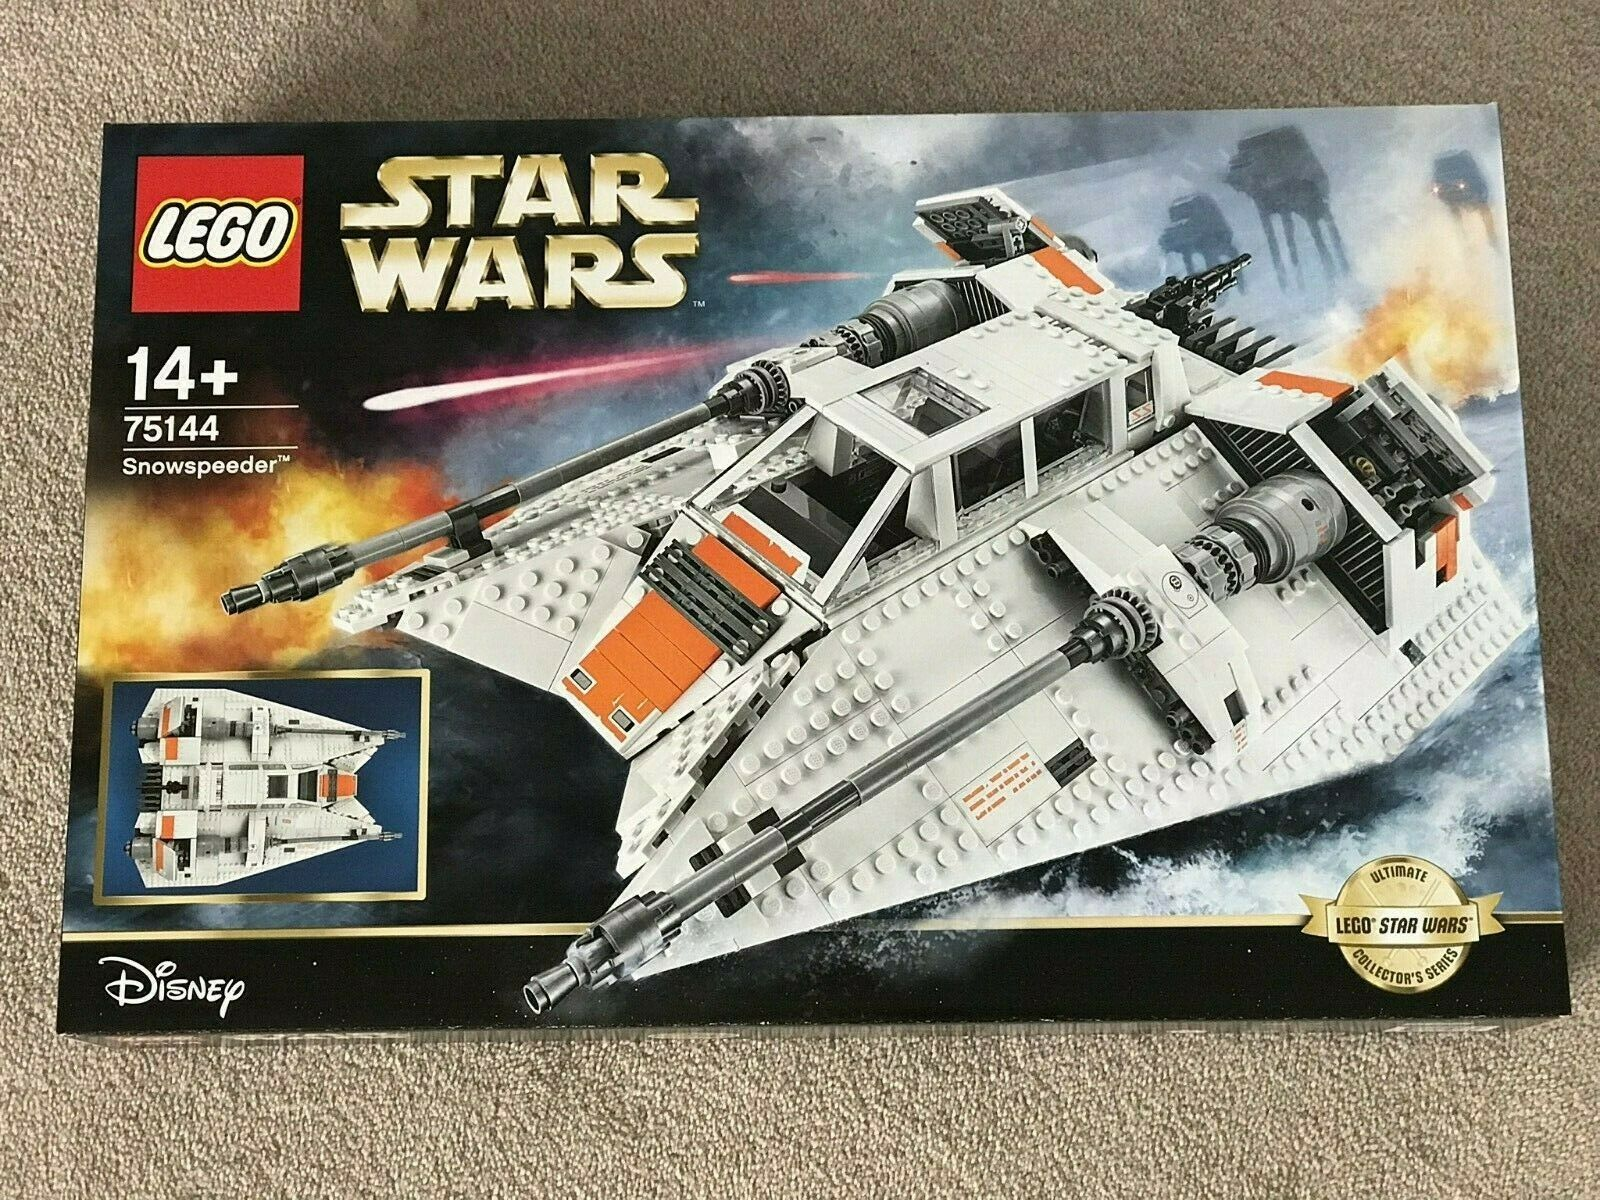 Lego Star Wars 75144 Snowspeeder Ultimate Collector Series BRAND NEW UCS